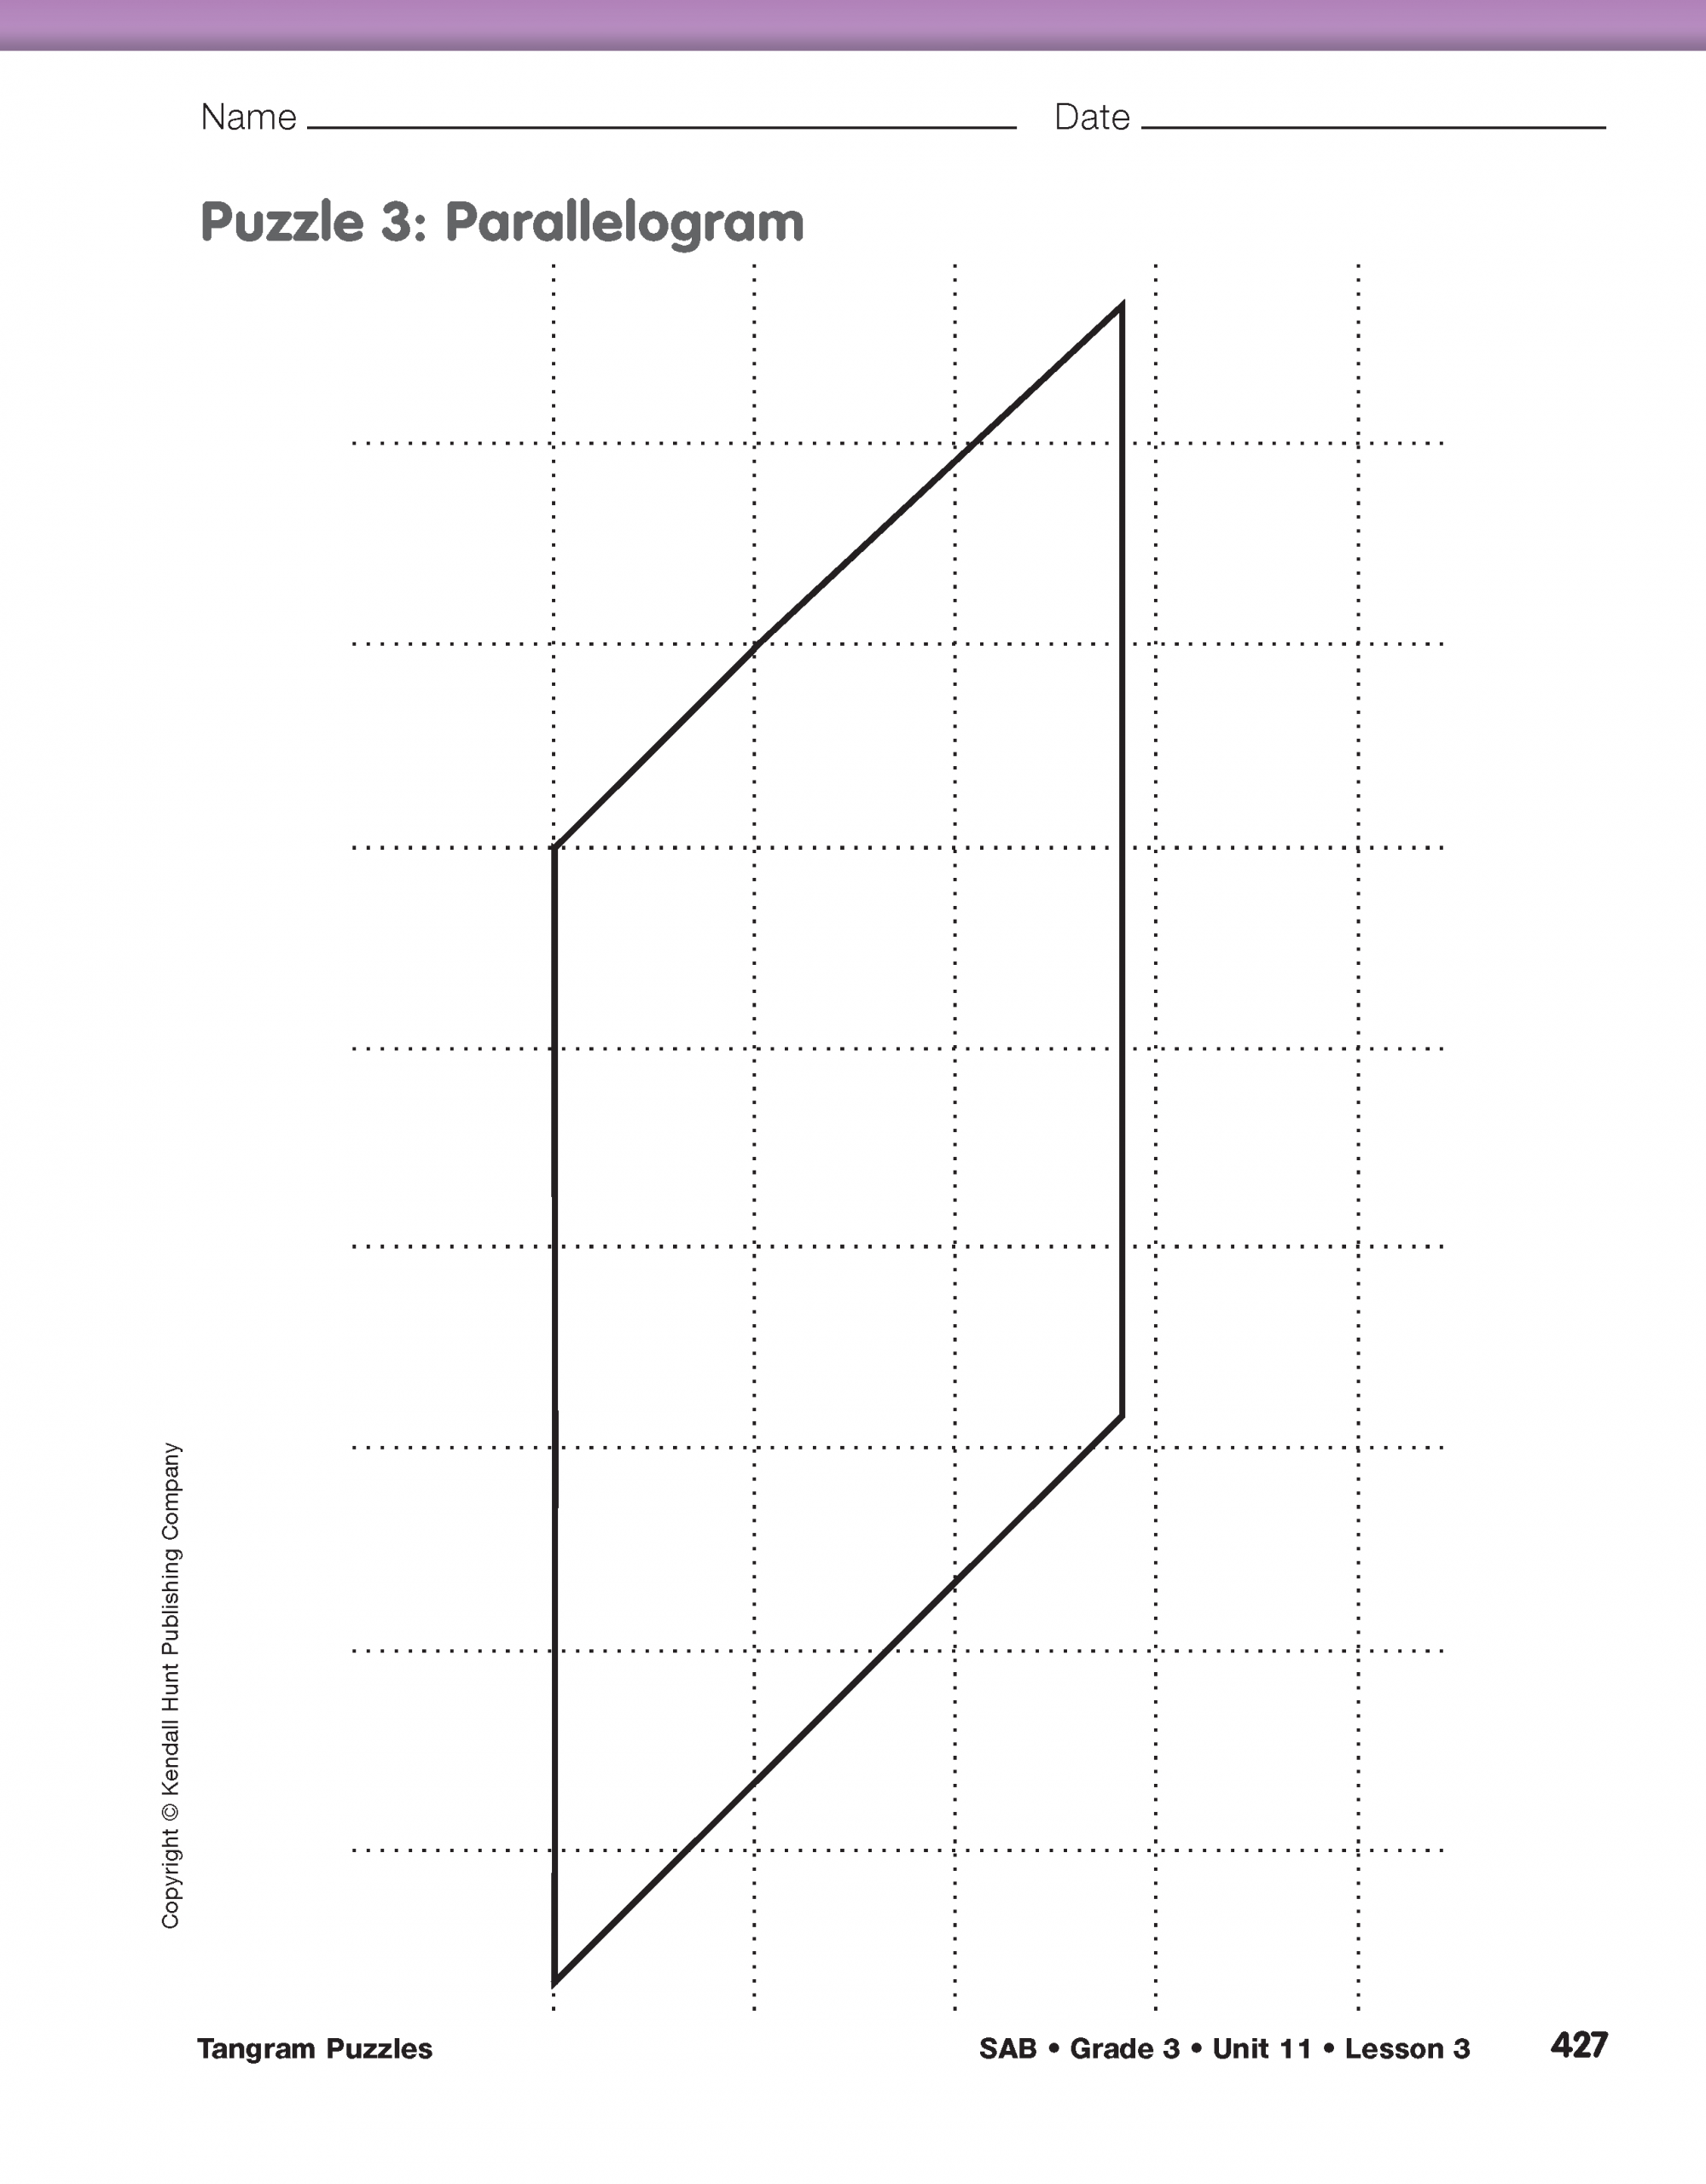 Math Trailblazers dedans Progression Tangram